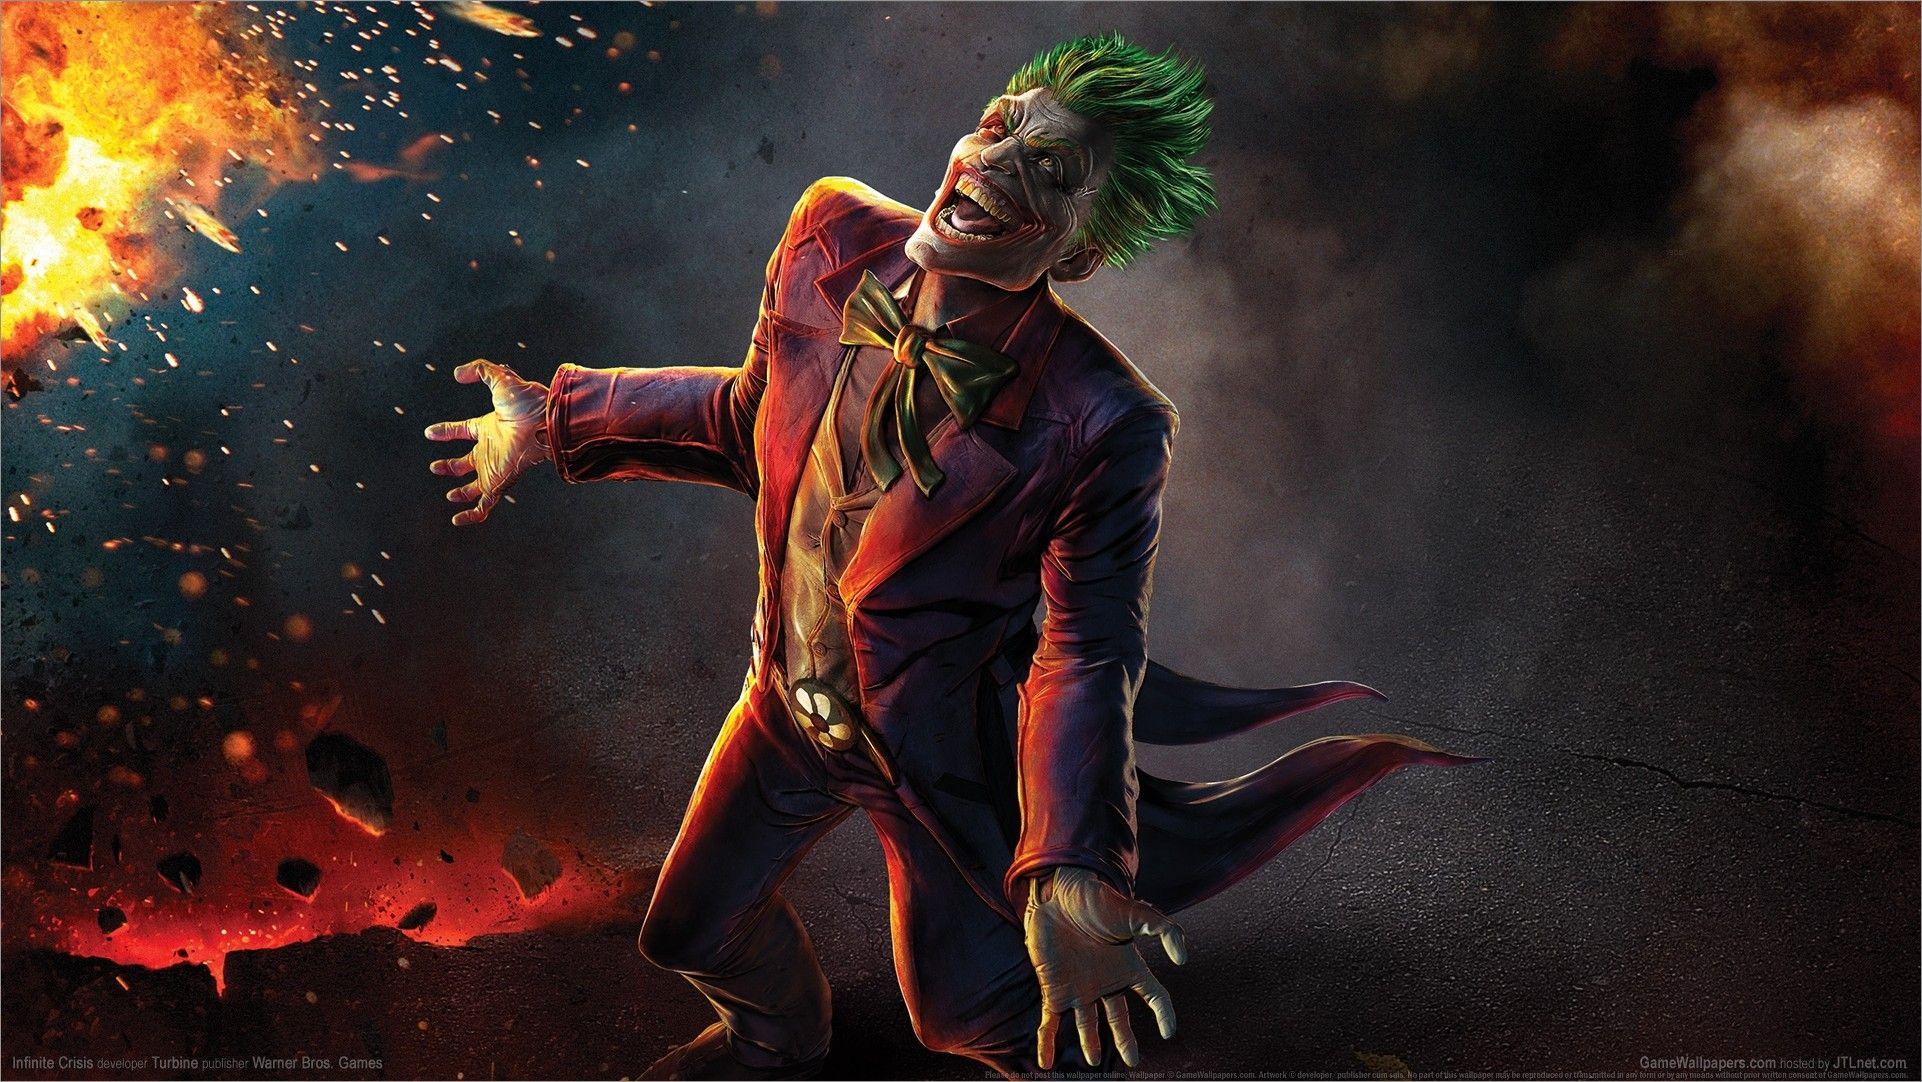 Zoom Wallpaper Full Hd In 2020 Joker Images Gaming Wallpapers Hd Cool Wallpapers